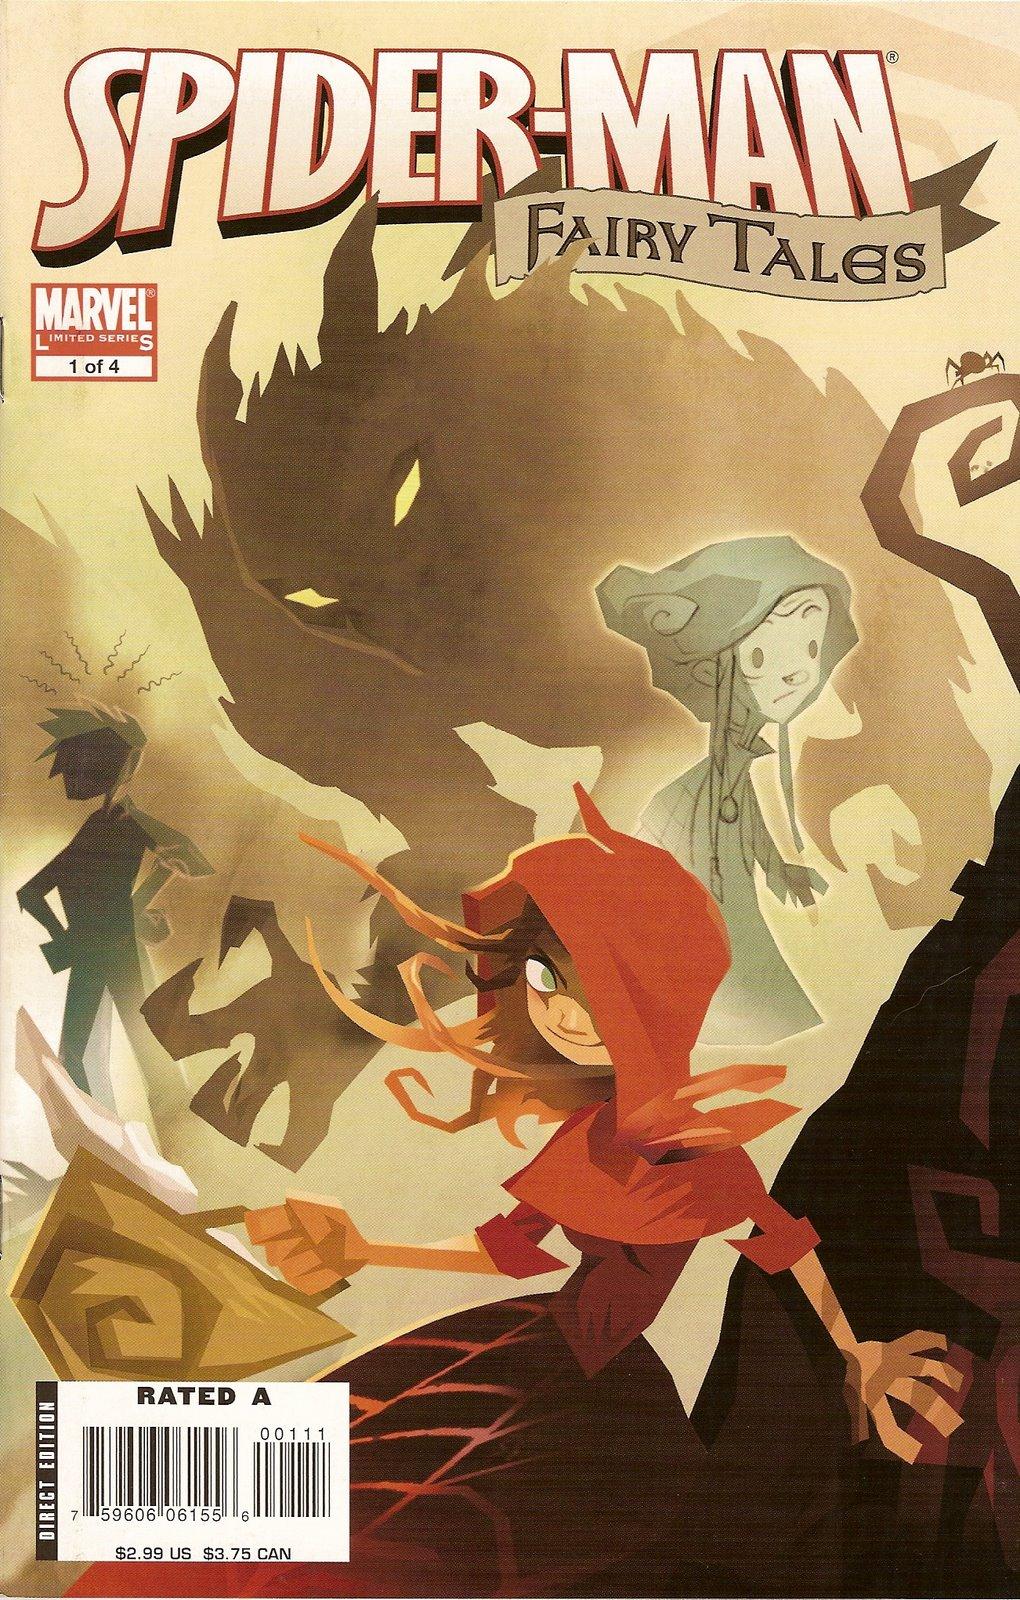 [Spider-man+Fairy+Tales+]